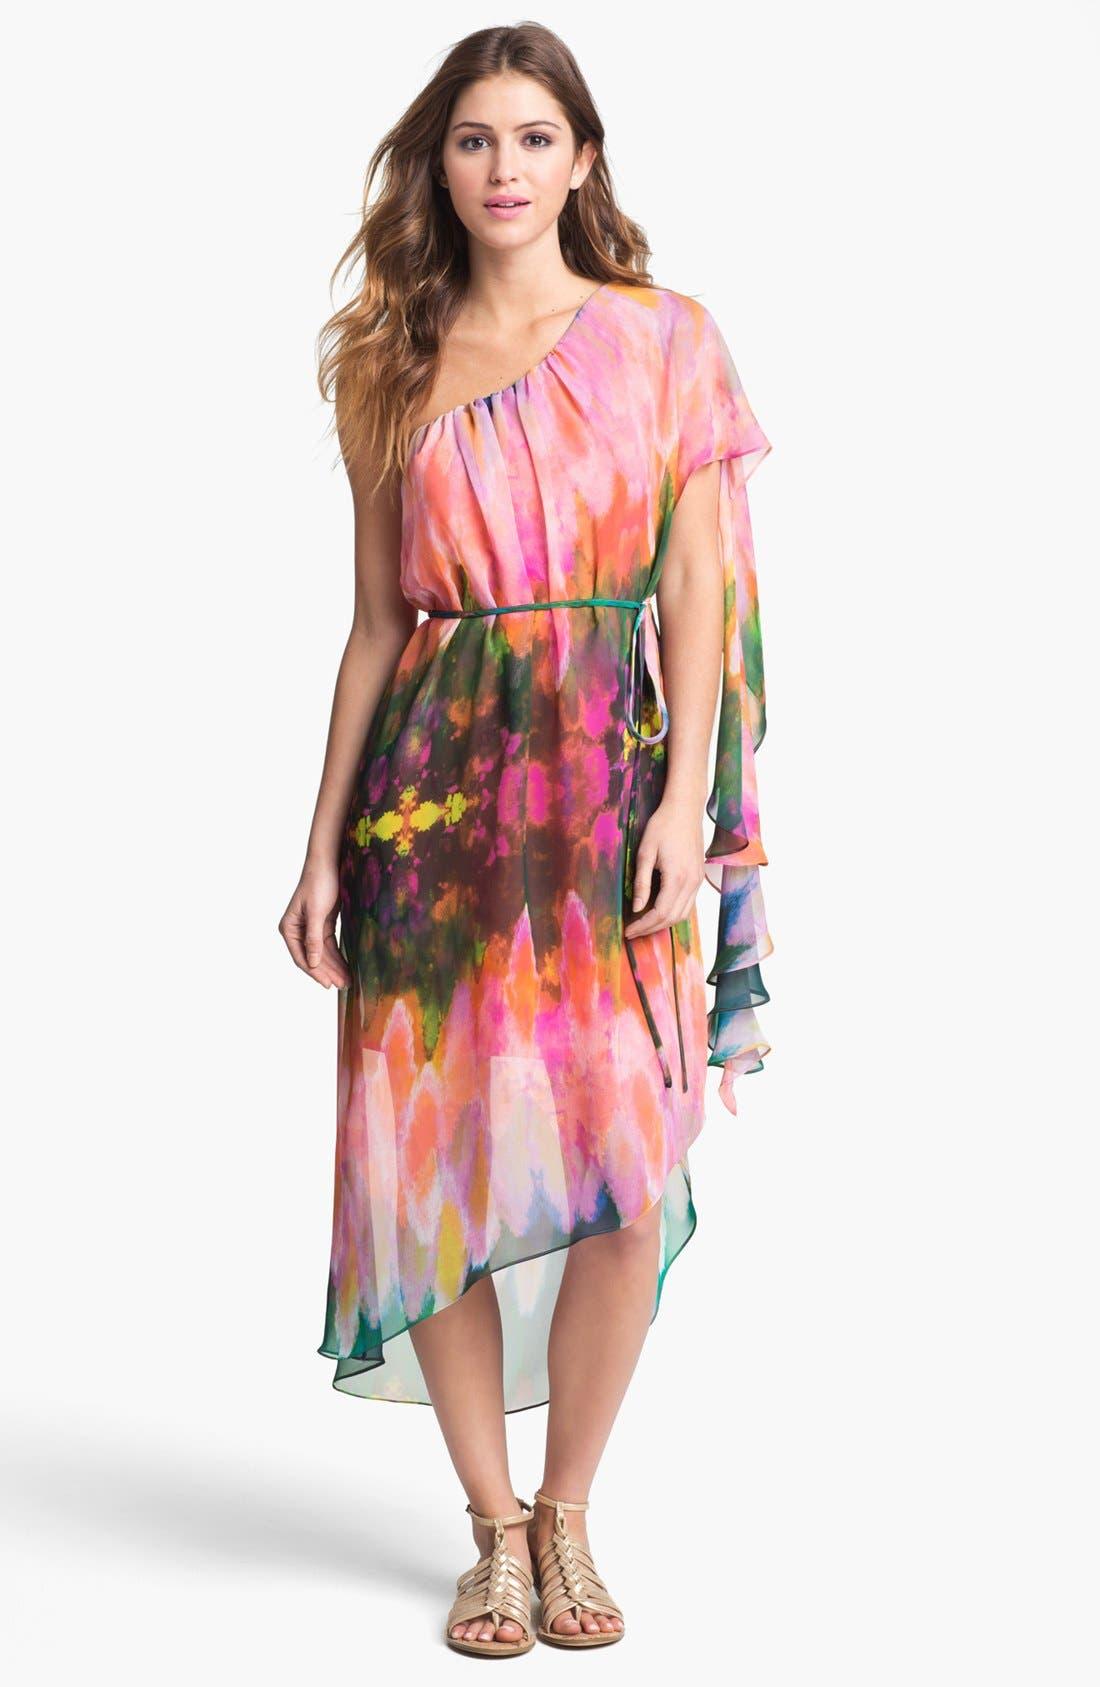 Alternate Image 1 Selected - Abi Ferrin 'Hera' One Shoulder Print Chiffon Dress